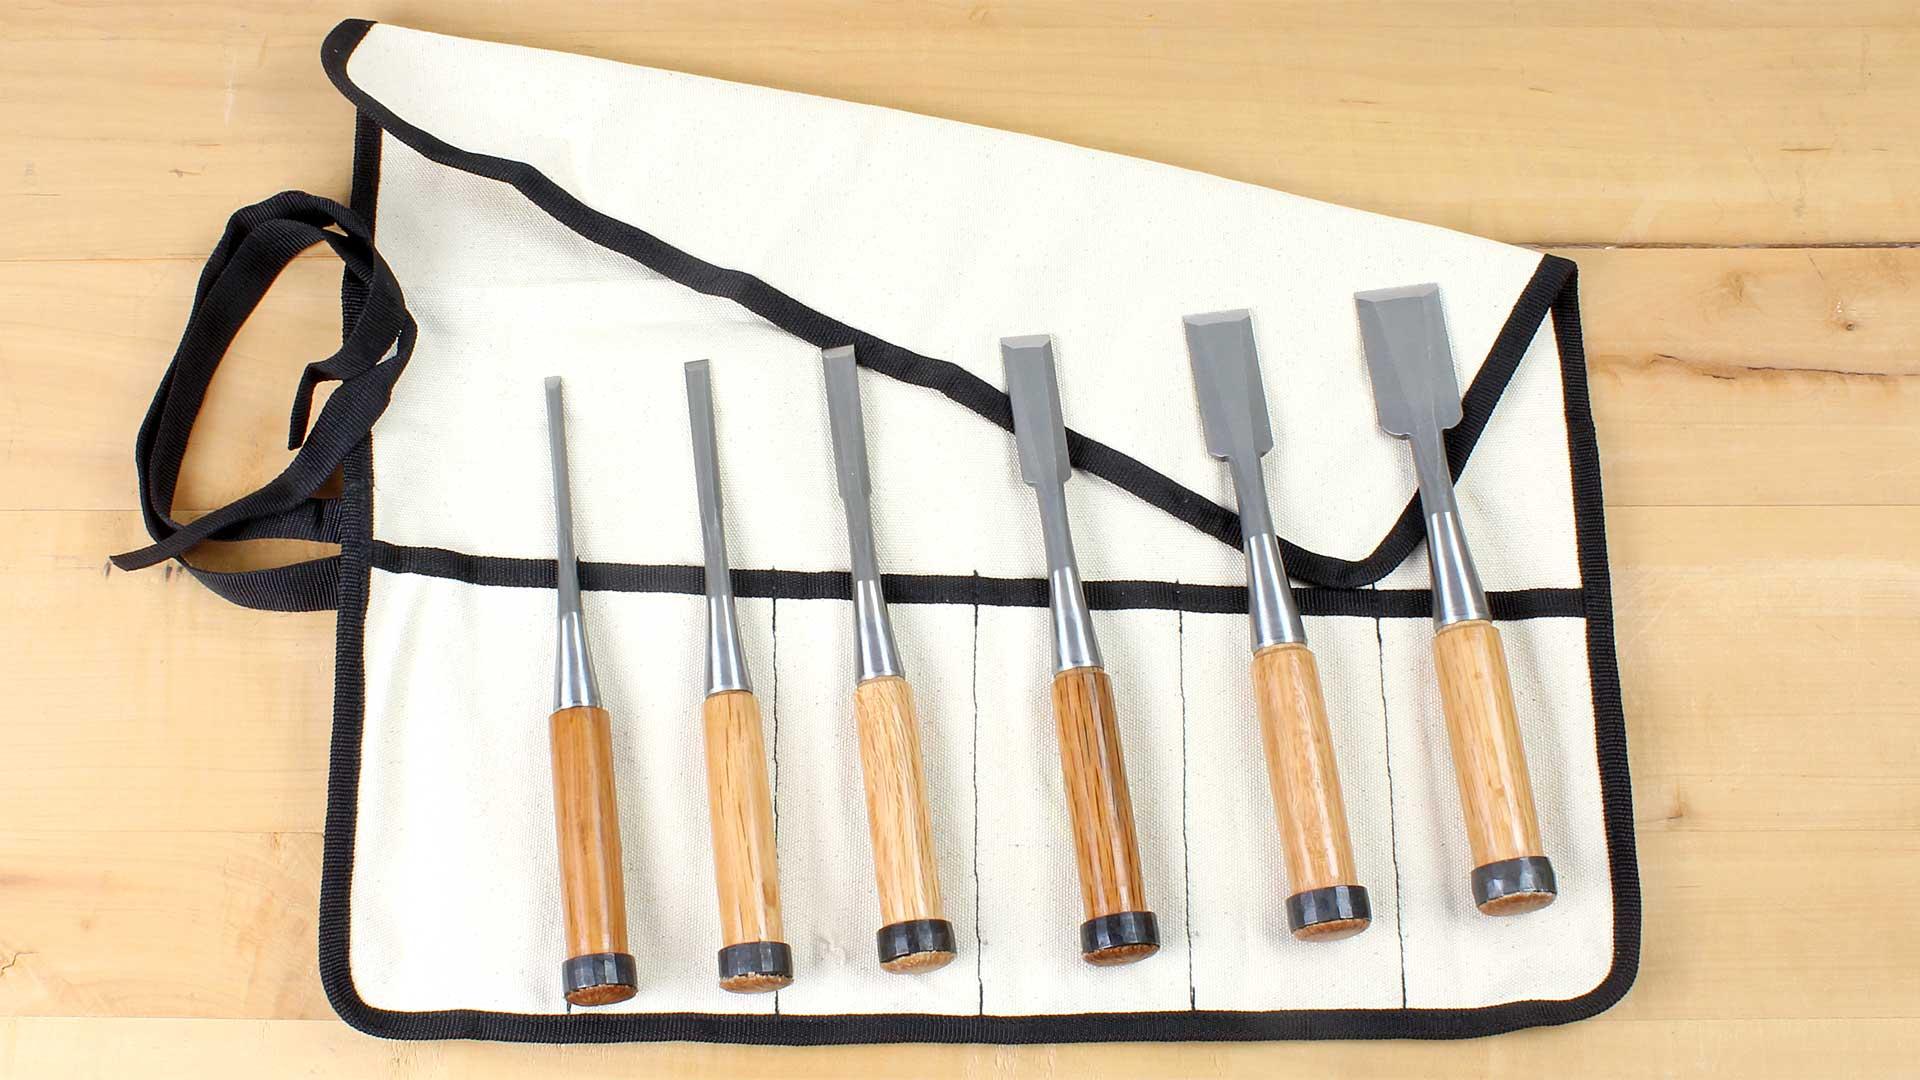 HSS Nomi Japanese Wood Chisels